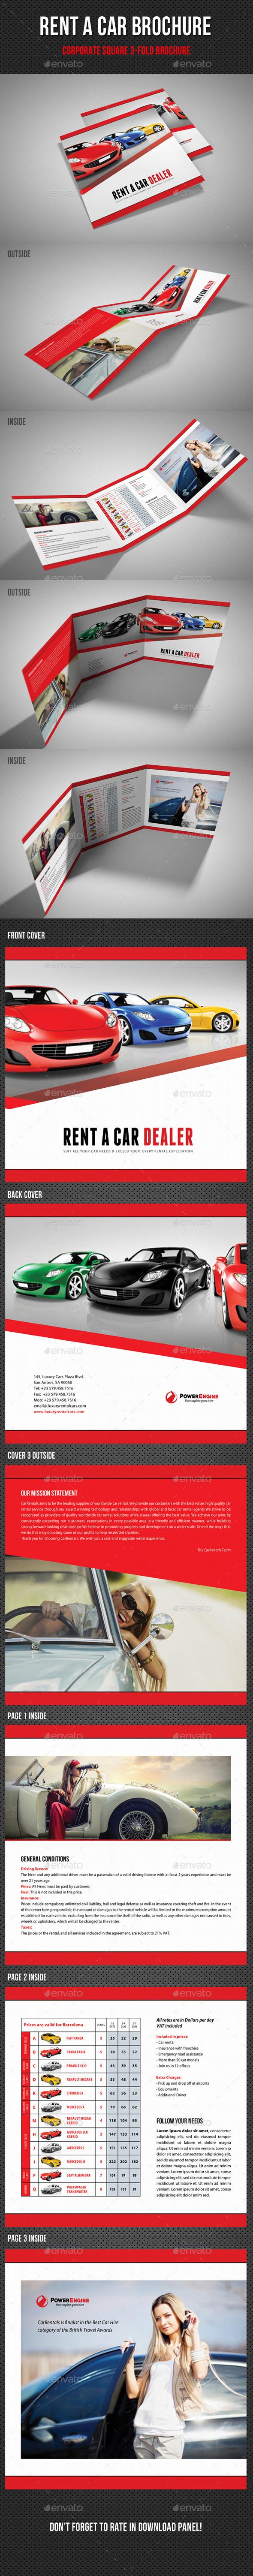 GraphicRiver Rent A Car Square 3-Fold Brochure 02 11438804